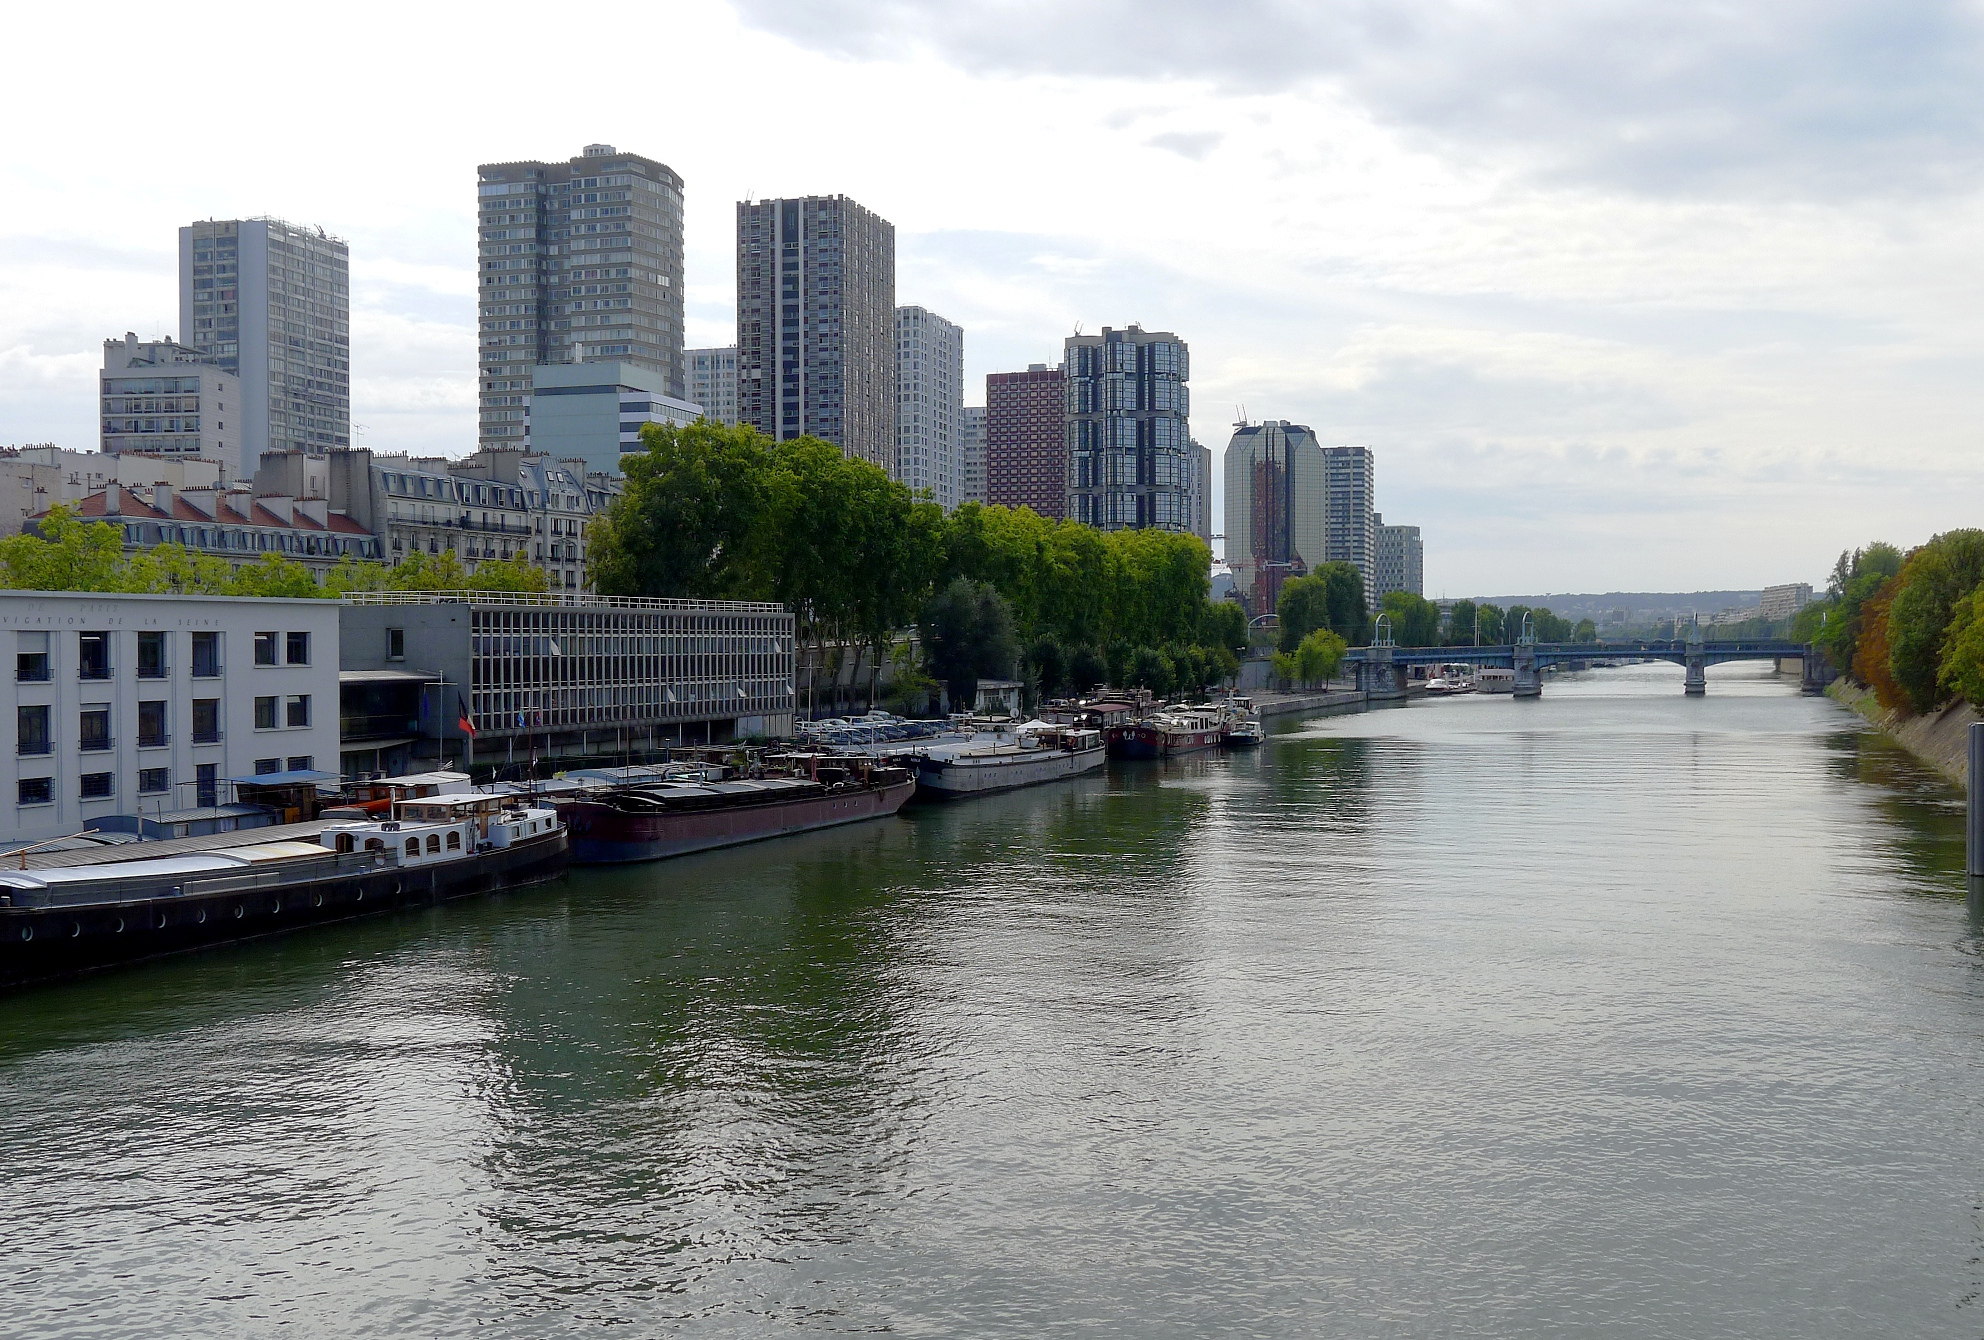 Seine port city france hd wallpapers and photos - Restaurant seine port ...